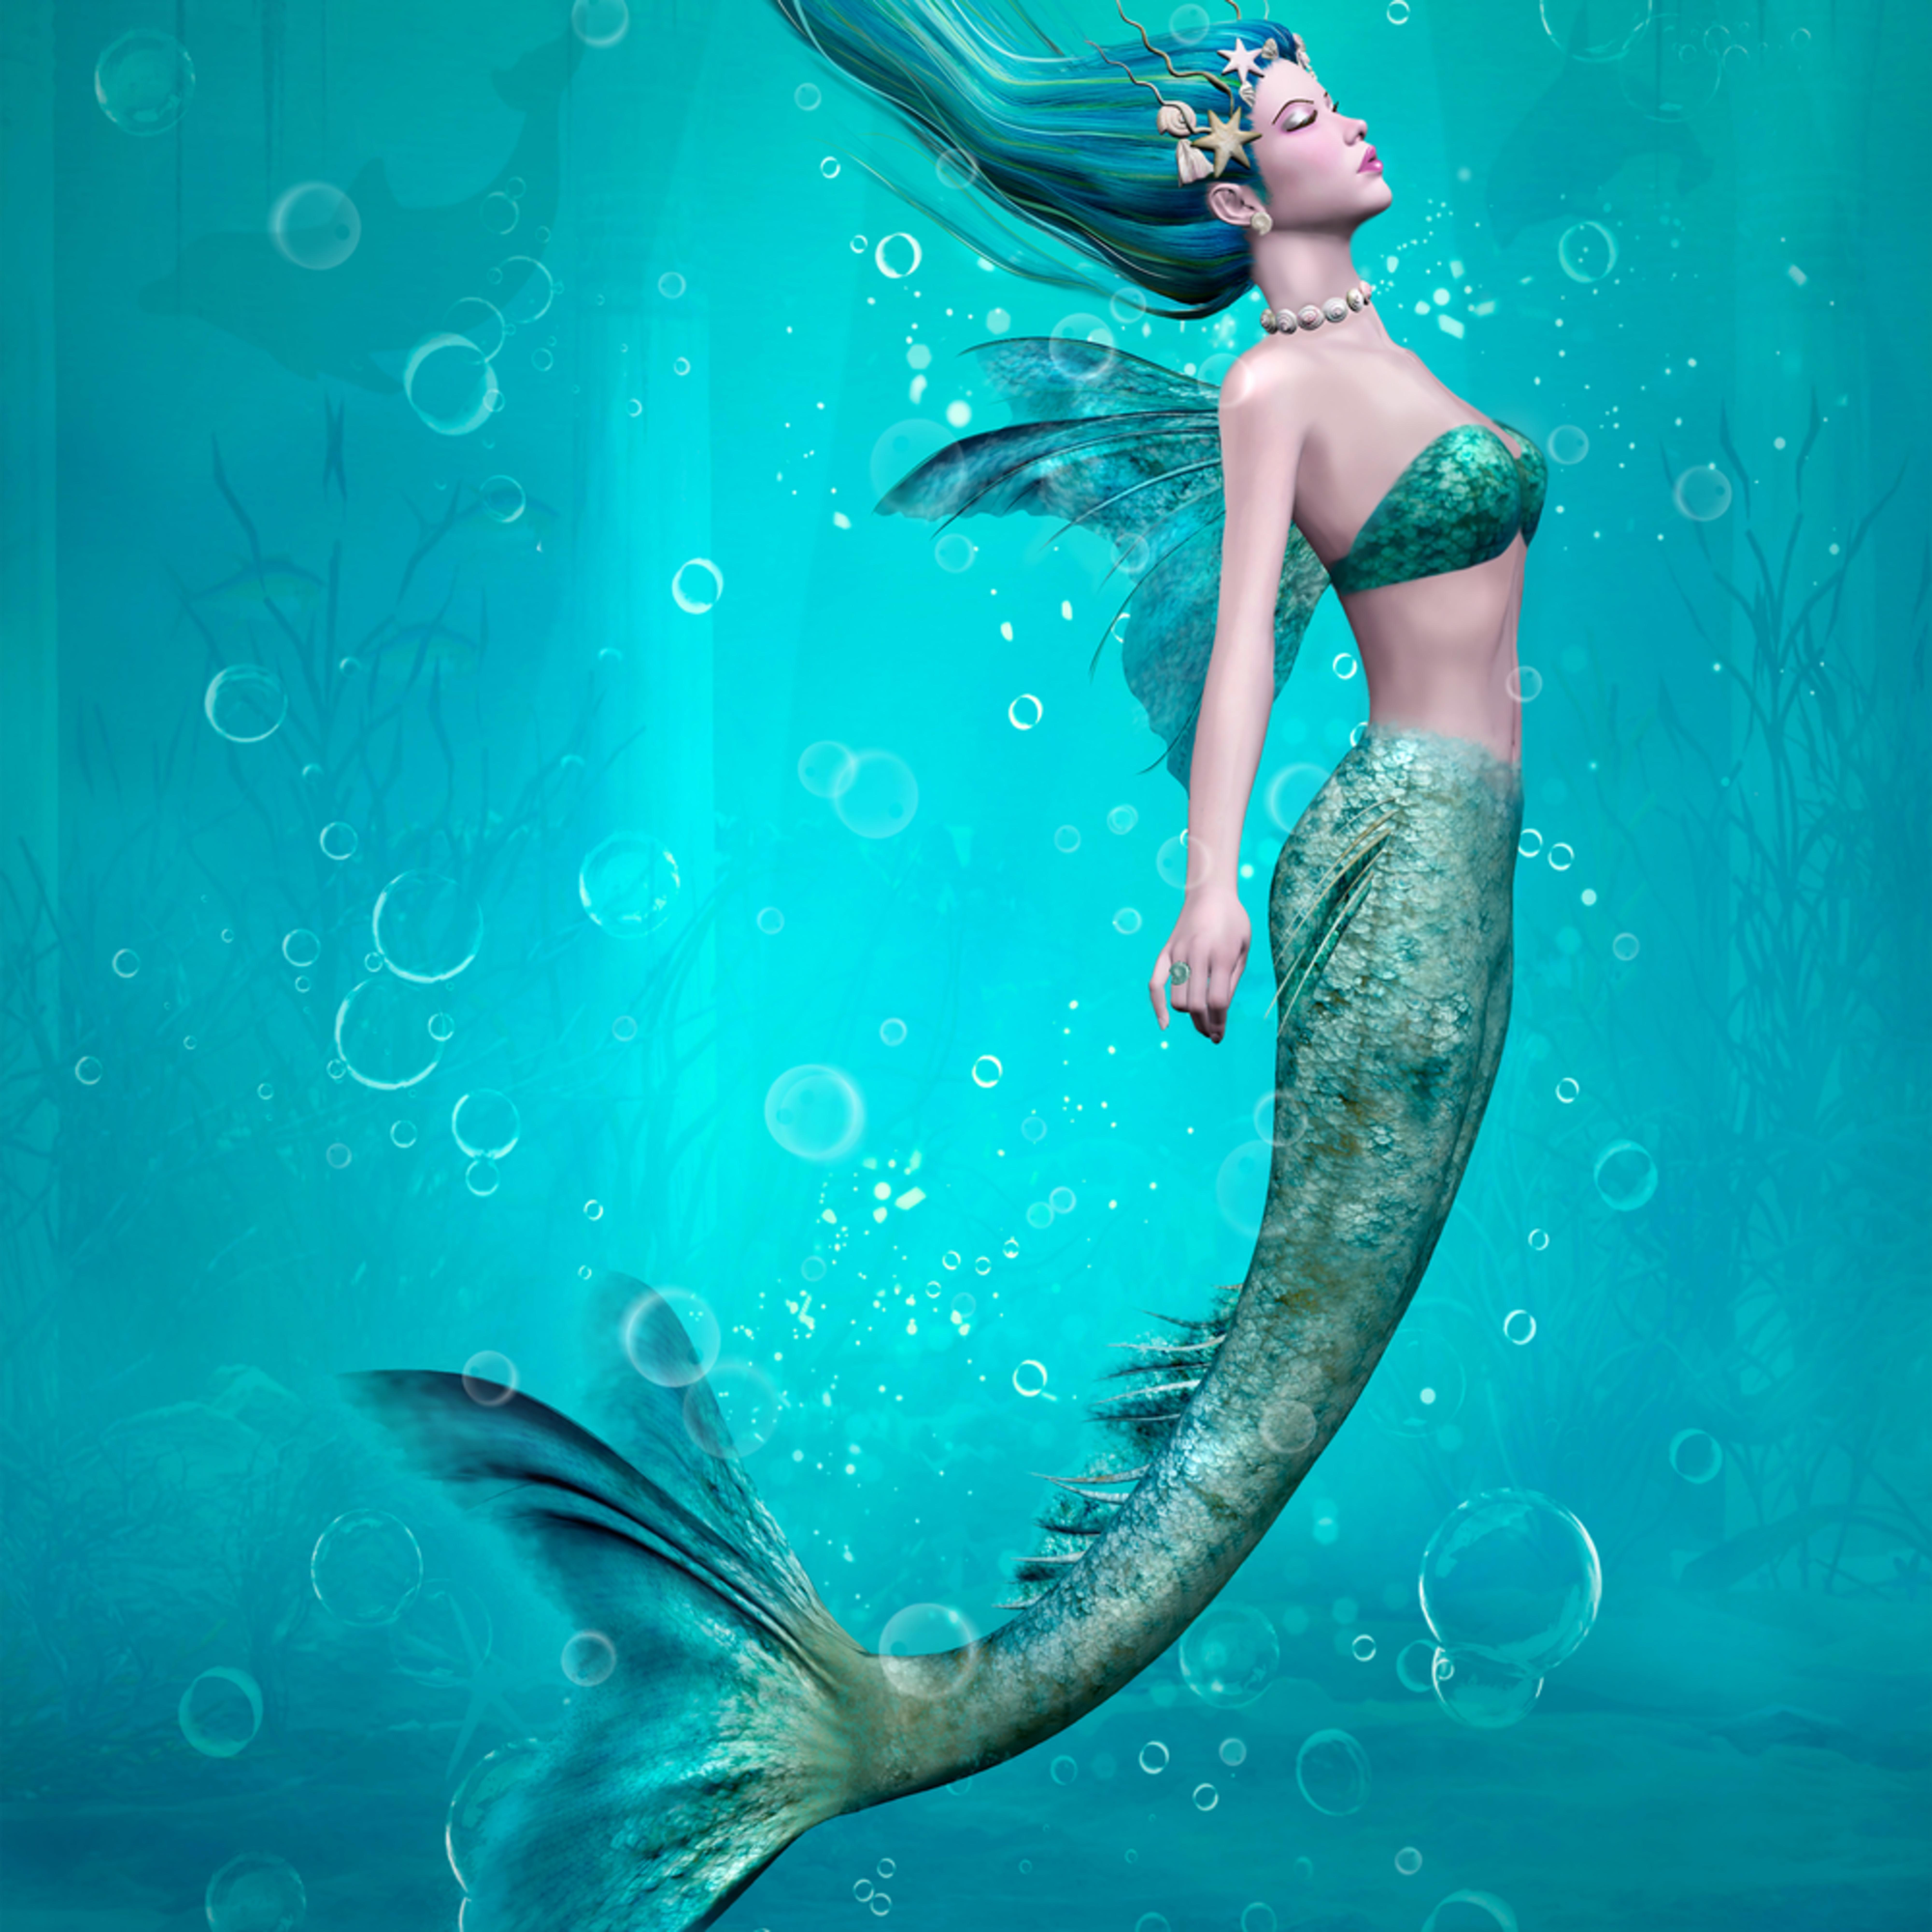 Underwater mermaid edit 300dpi fq659x